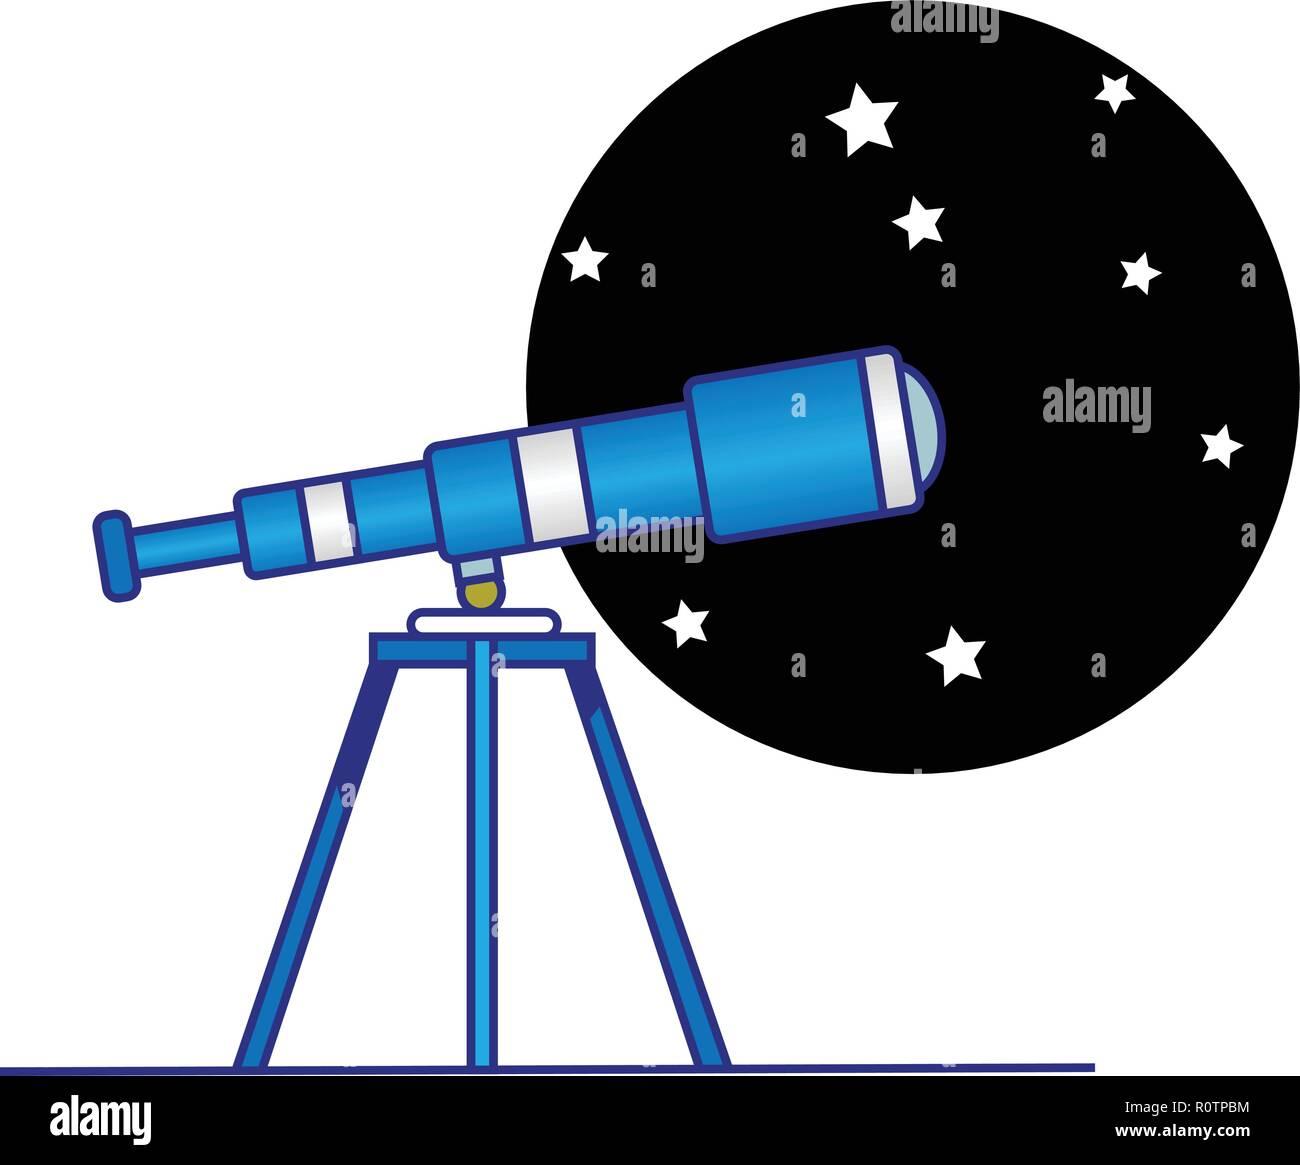 Pirates jumelles seeman télescope pirate télescope pirates télescope pirates jumelles